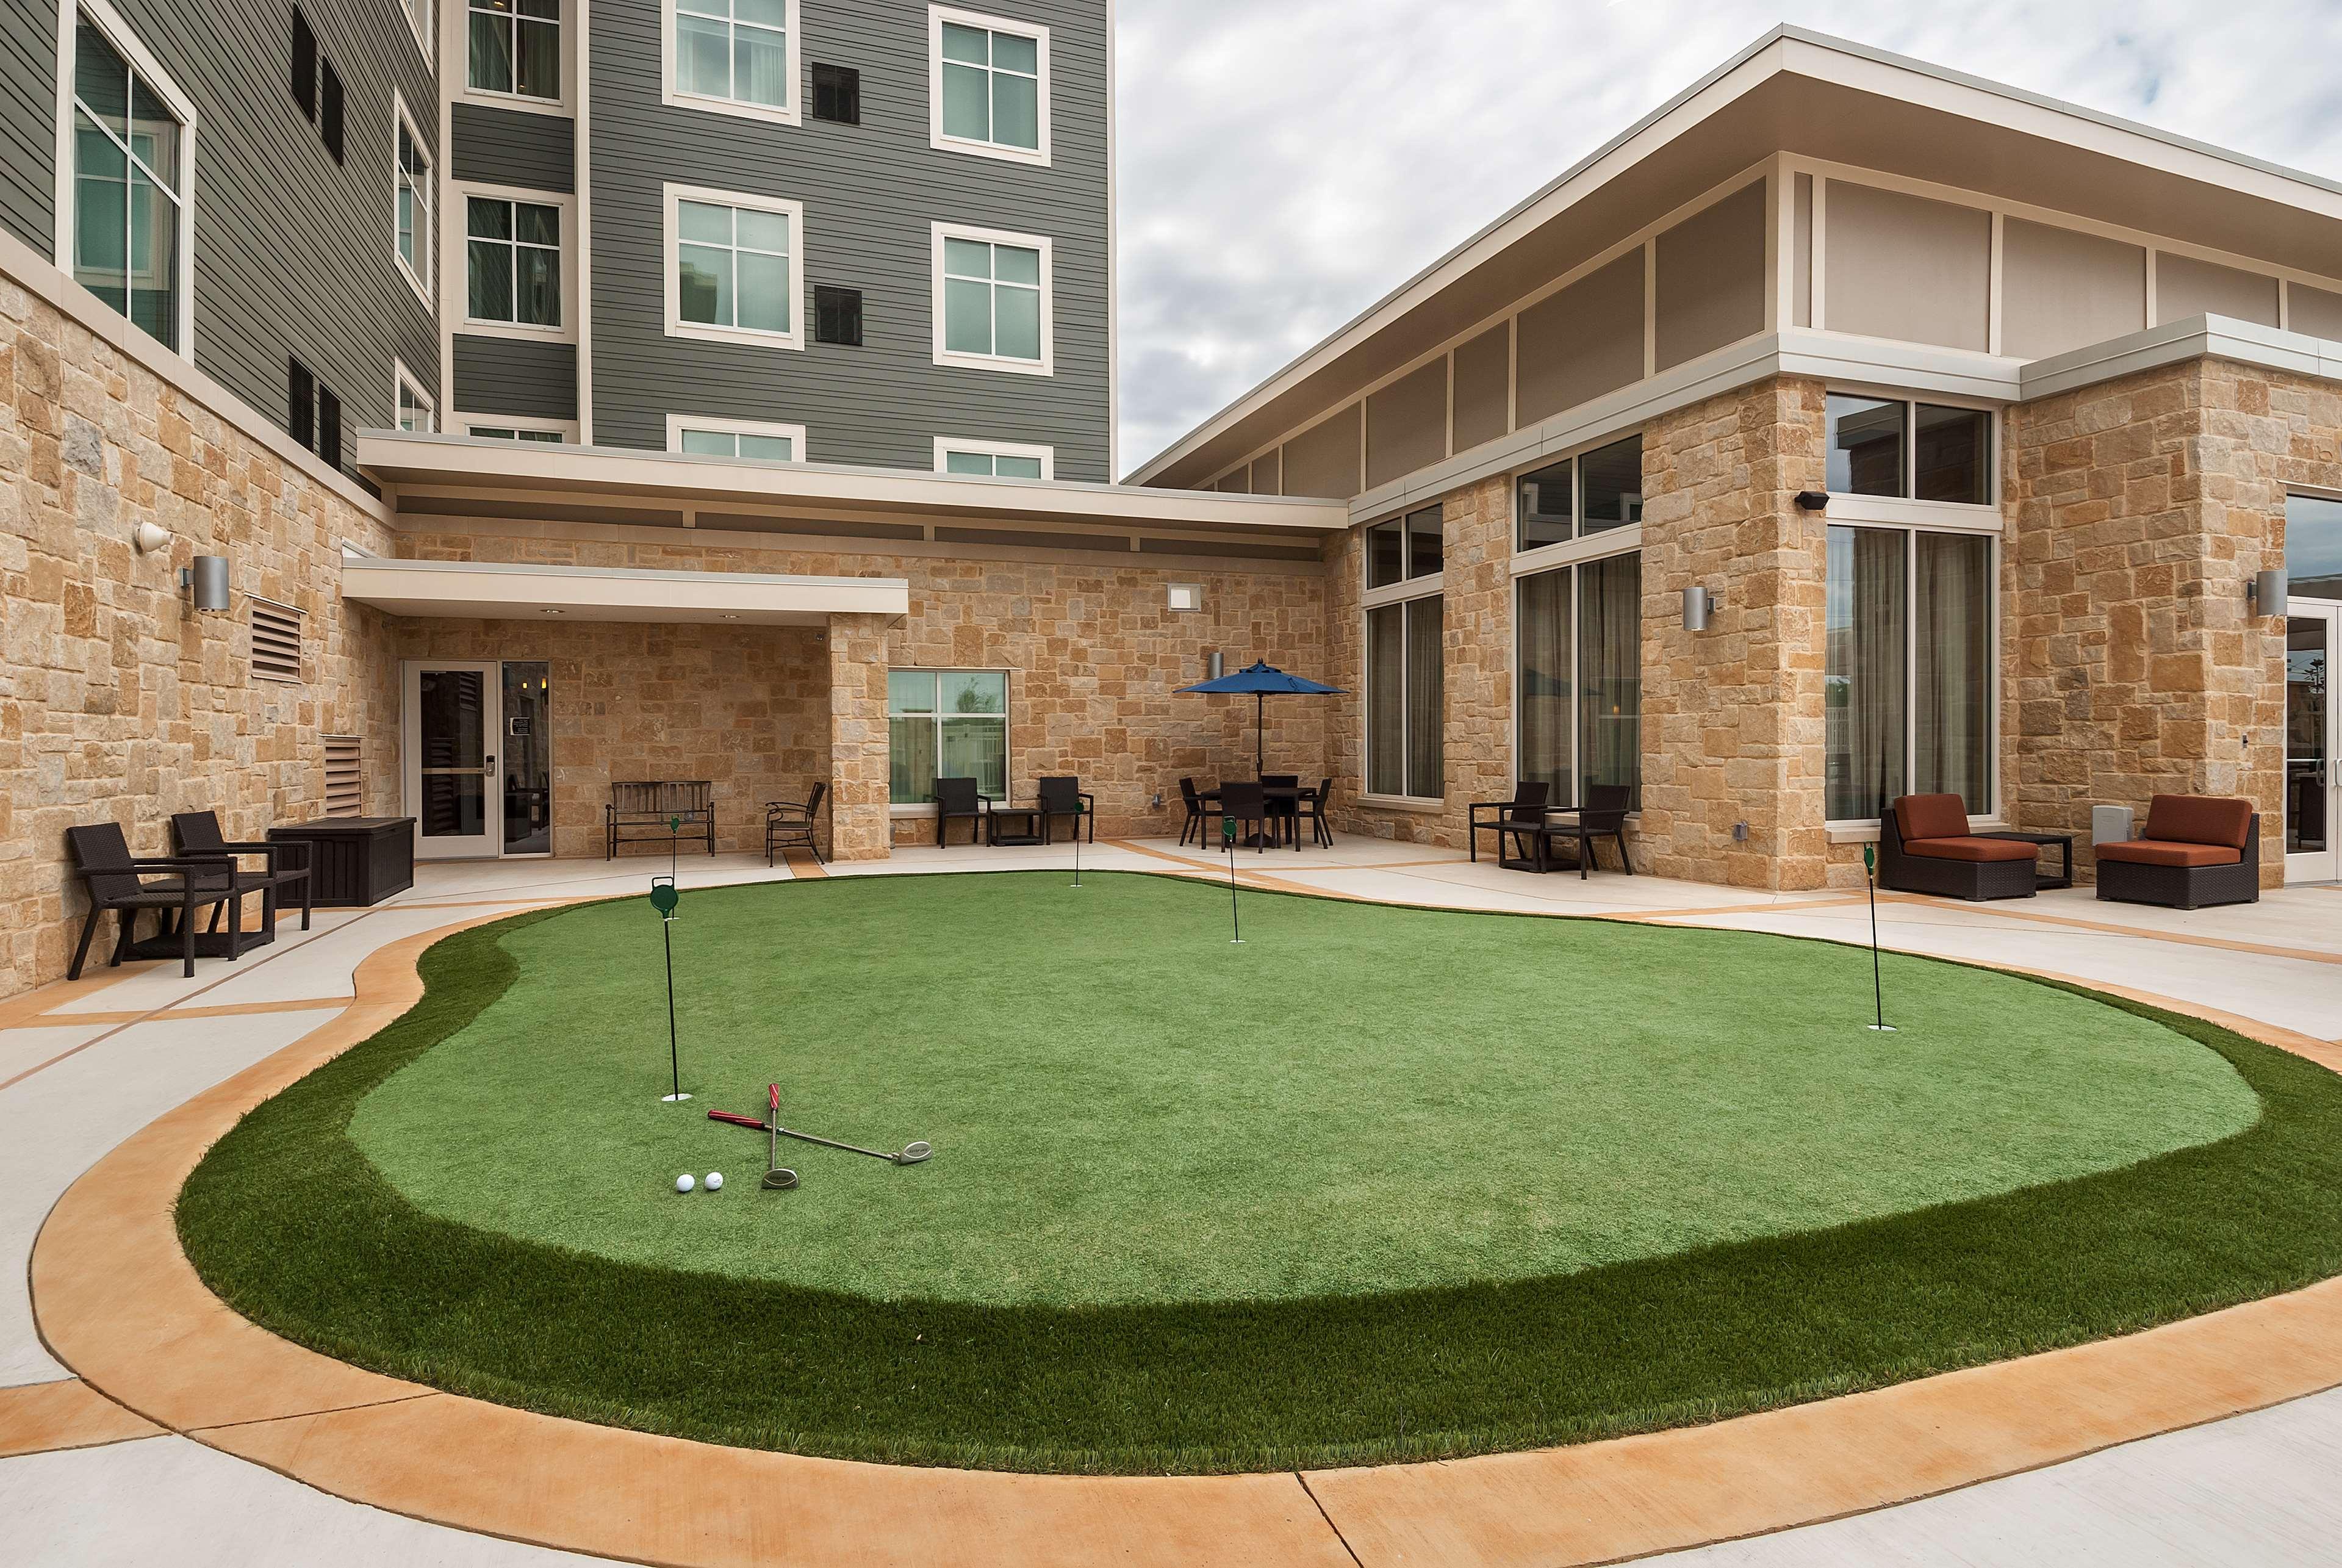 Homewood Suites by Hilton Fort Worth - Medical Center, TX image 26